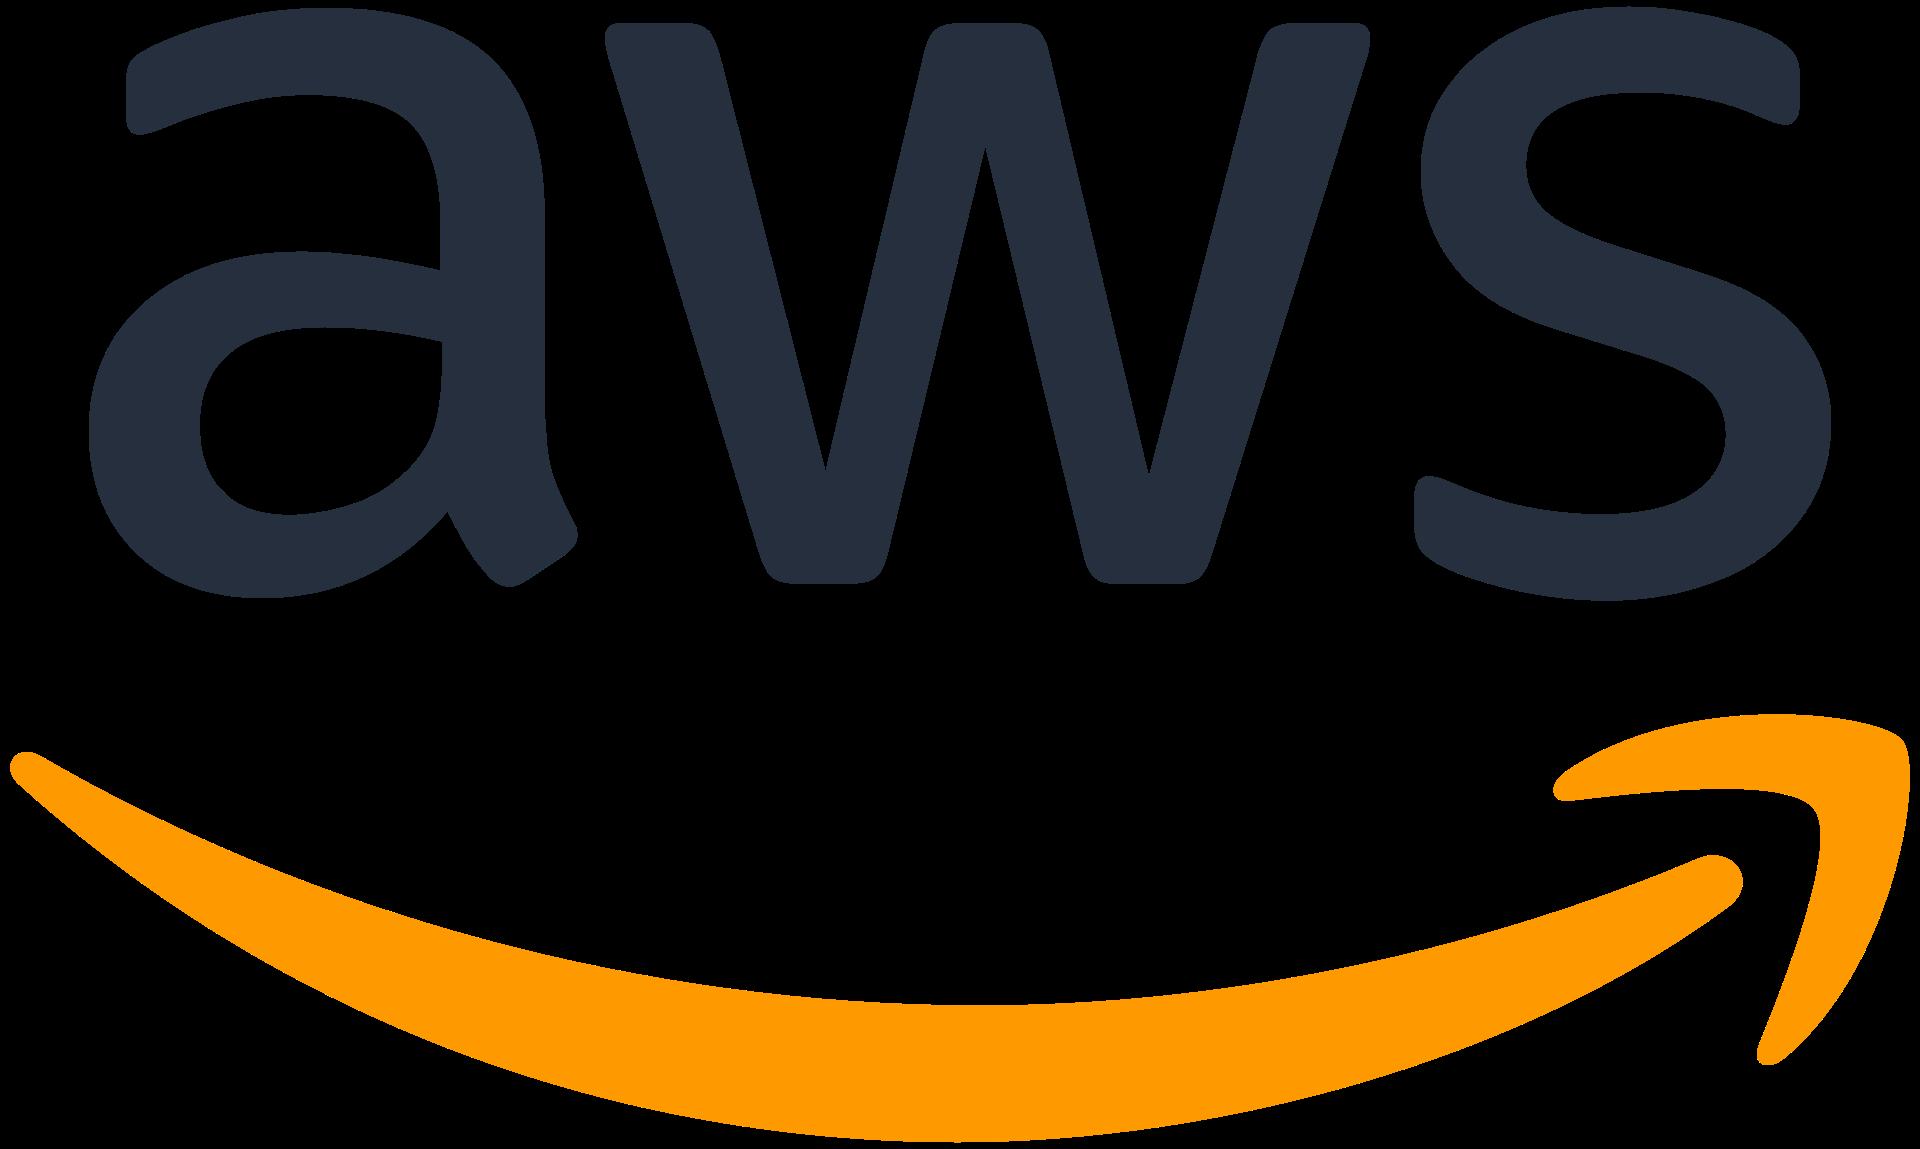 aws logosu